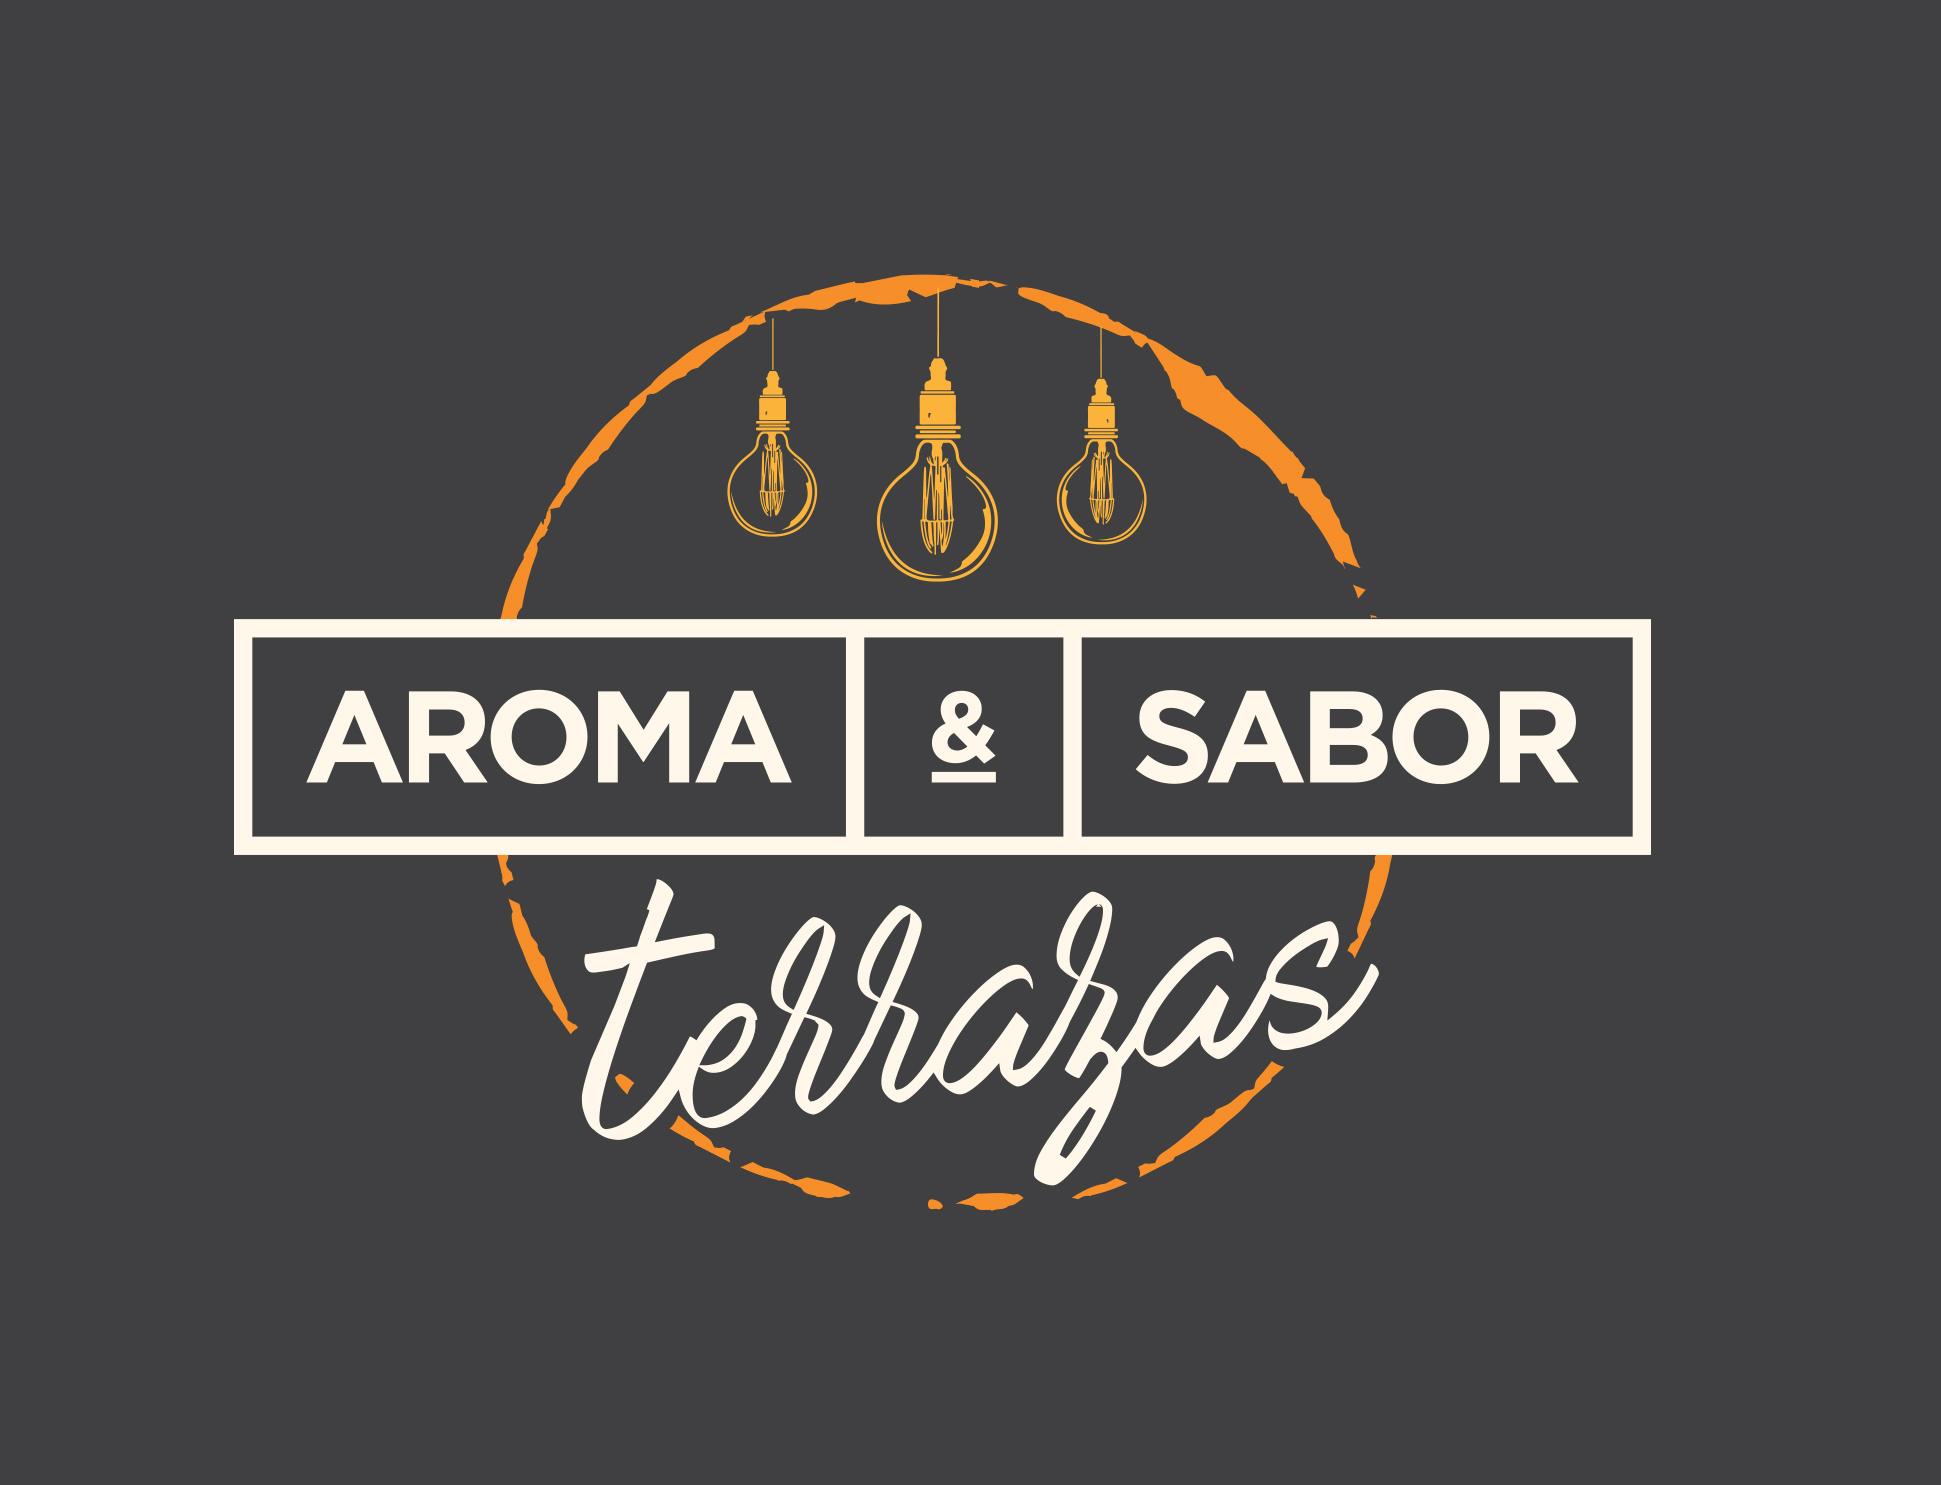 Aroma y Sabor Terrazas logo